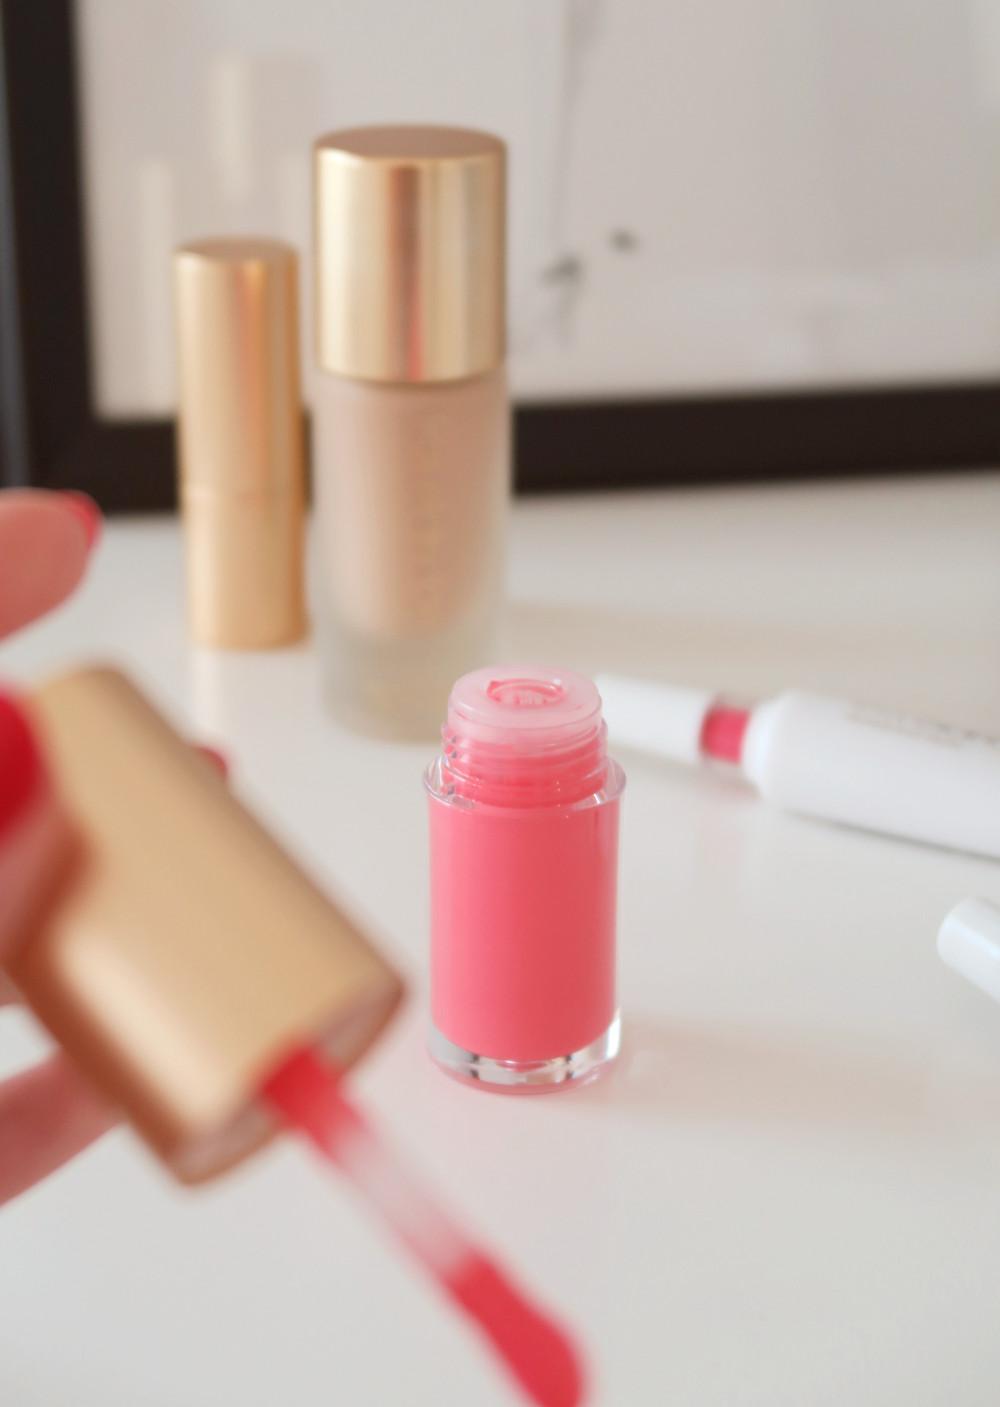 Lisa Eldridge Gloss Embrace Review